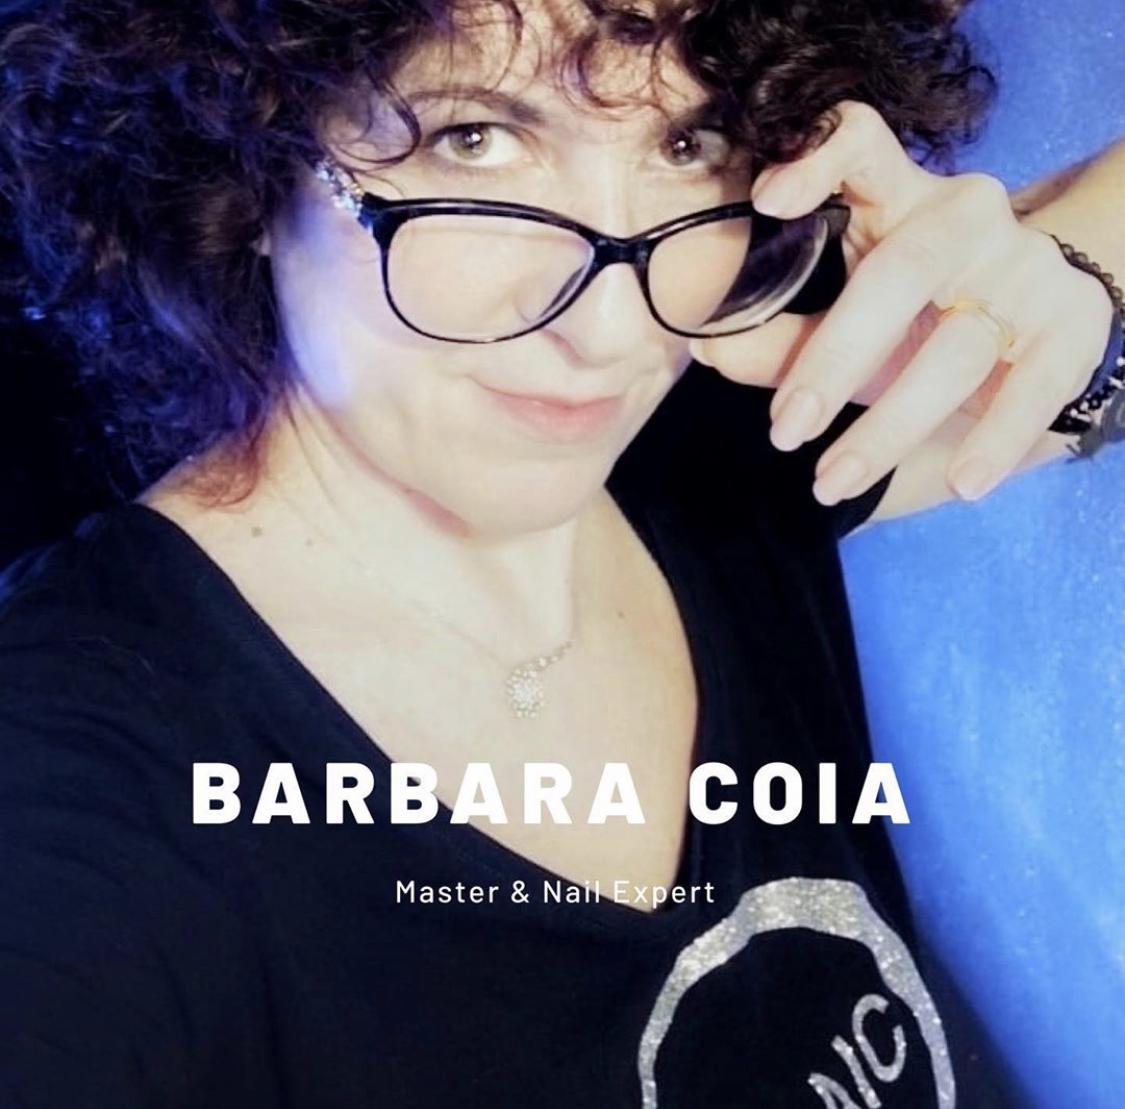 BARBARA COIA